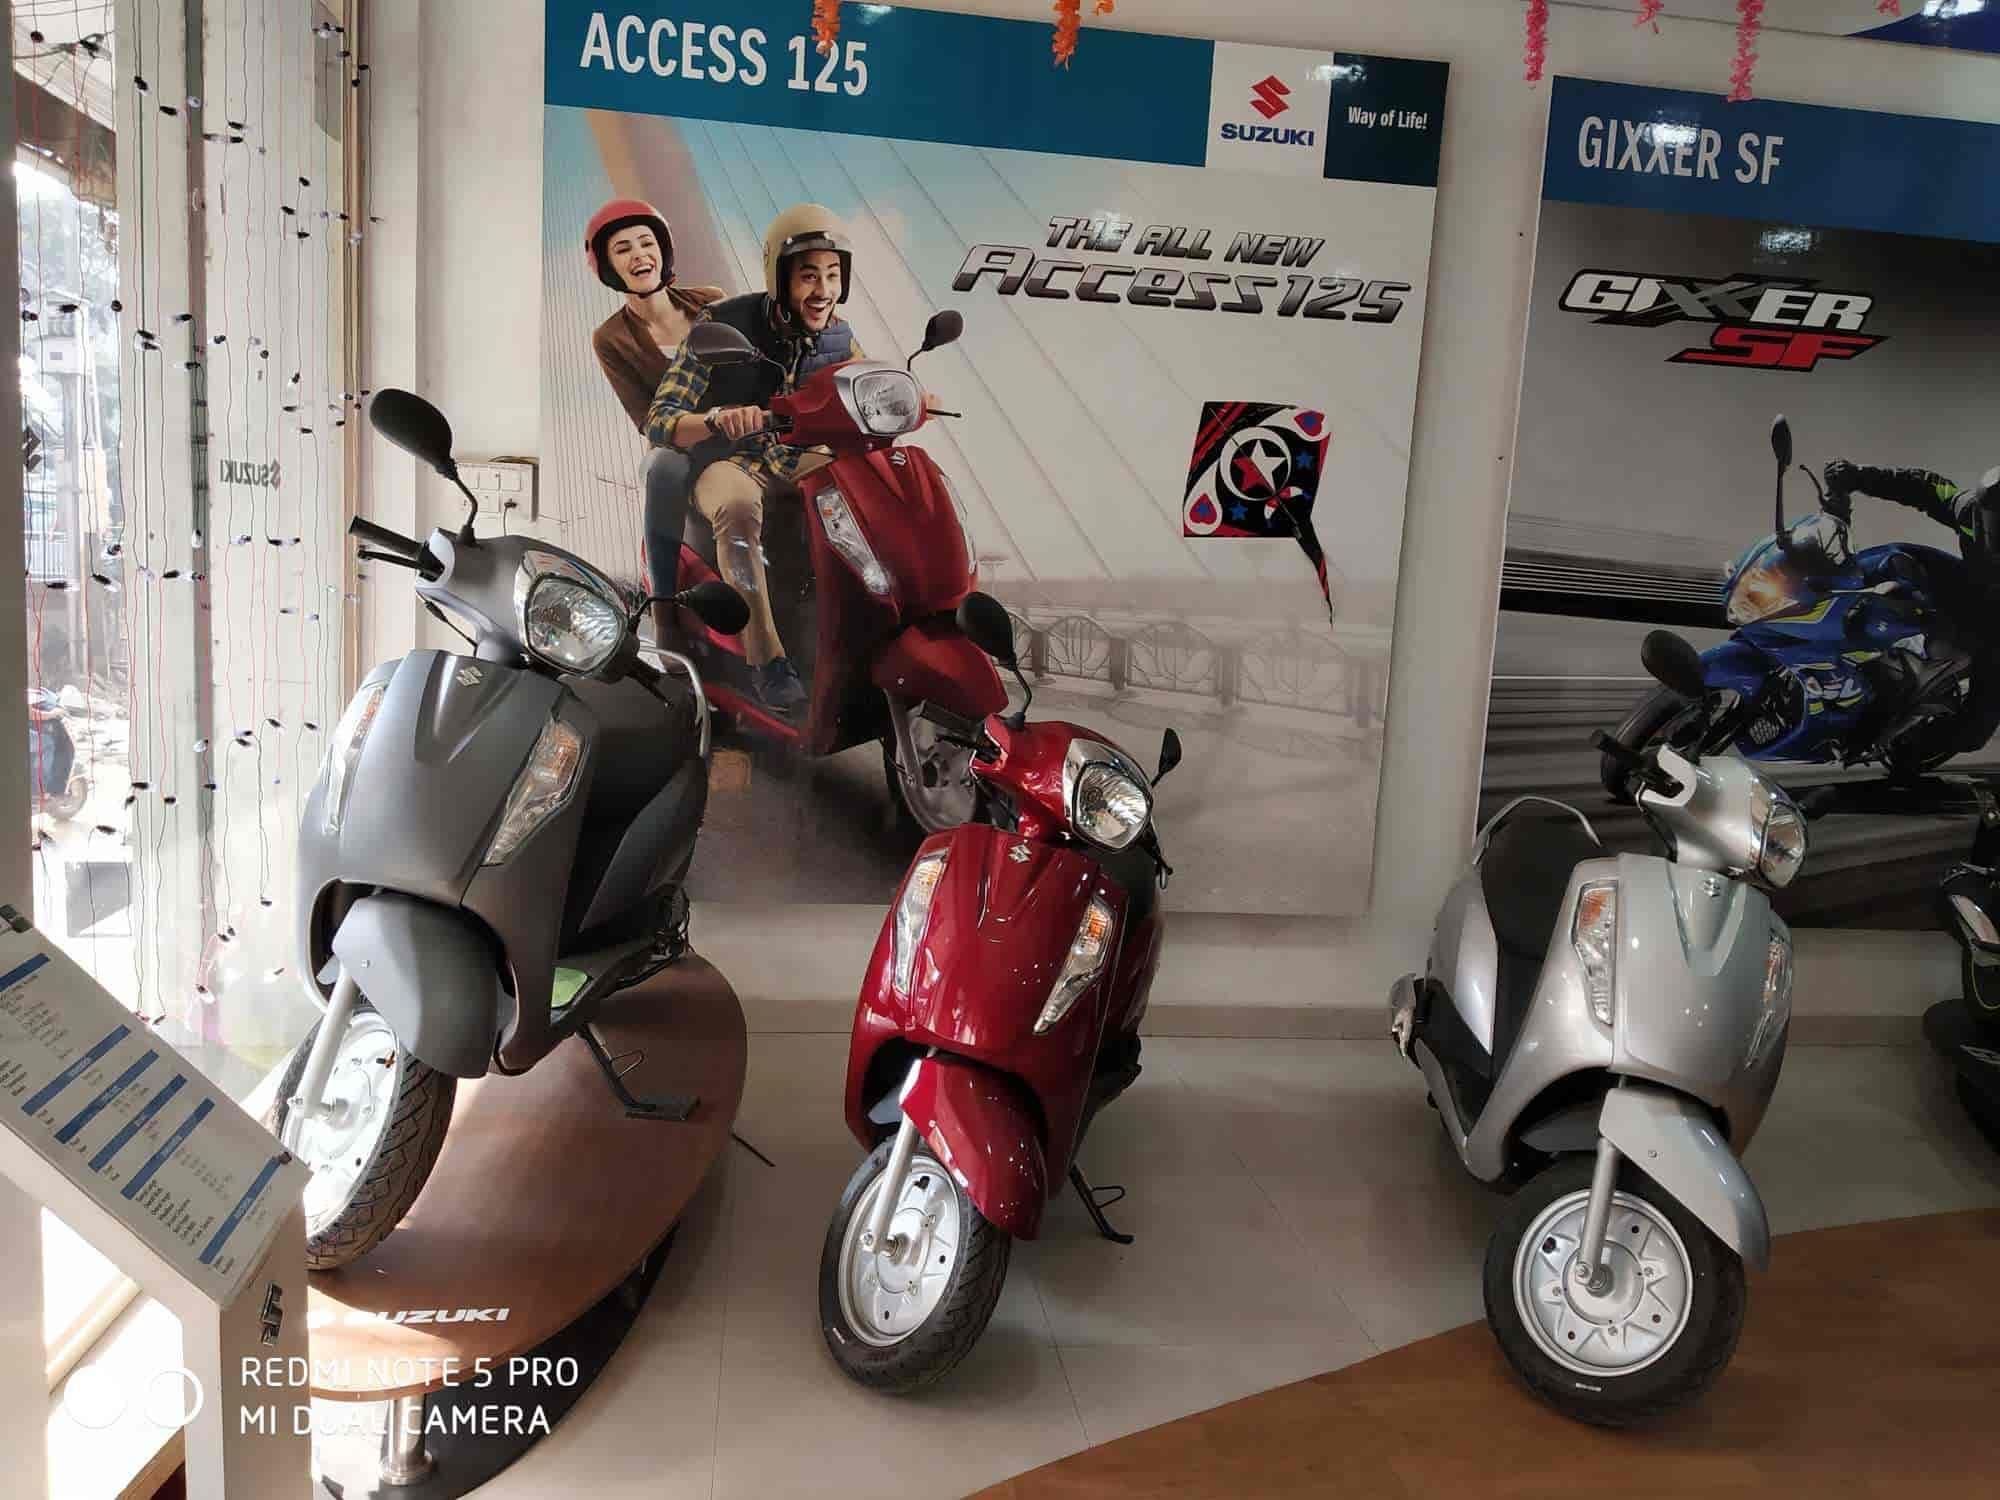 Midas Suzuki, Malakpet - Motorcycle Dealers-TVS in Hyderabad - Justdial